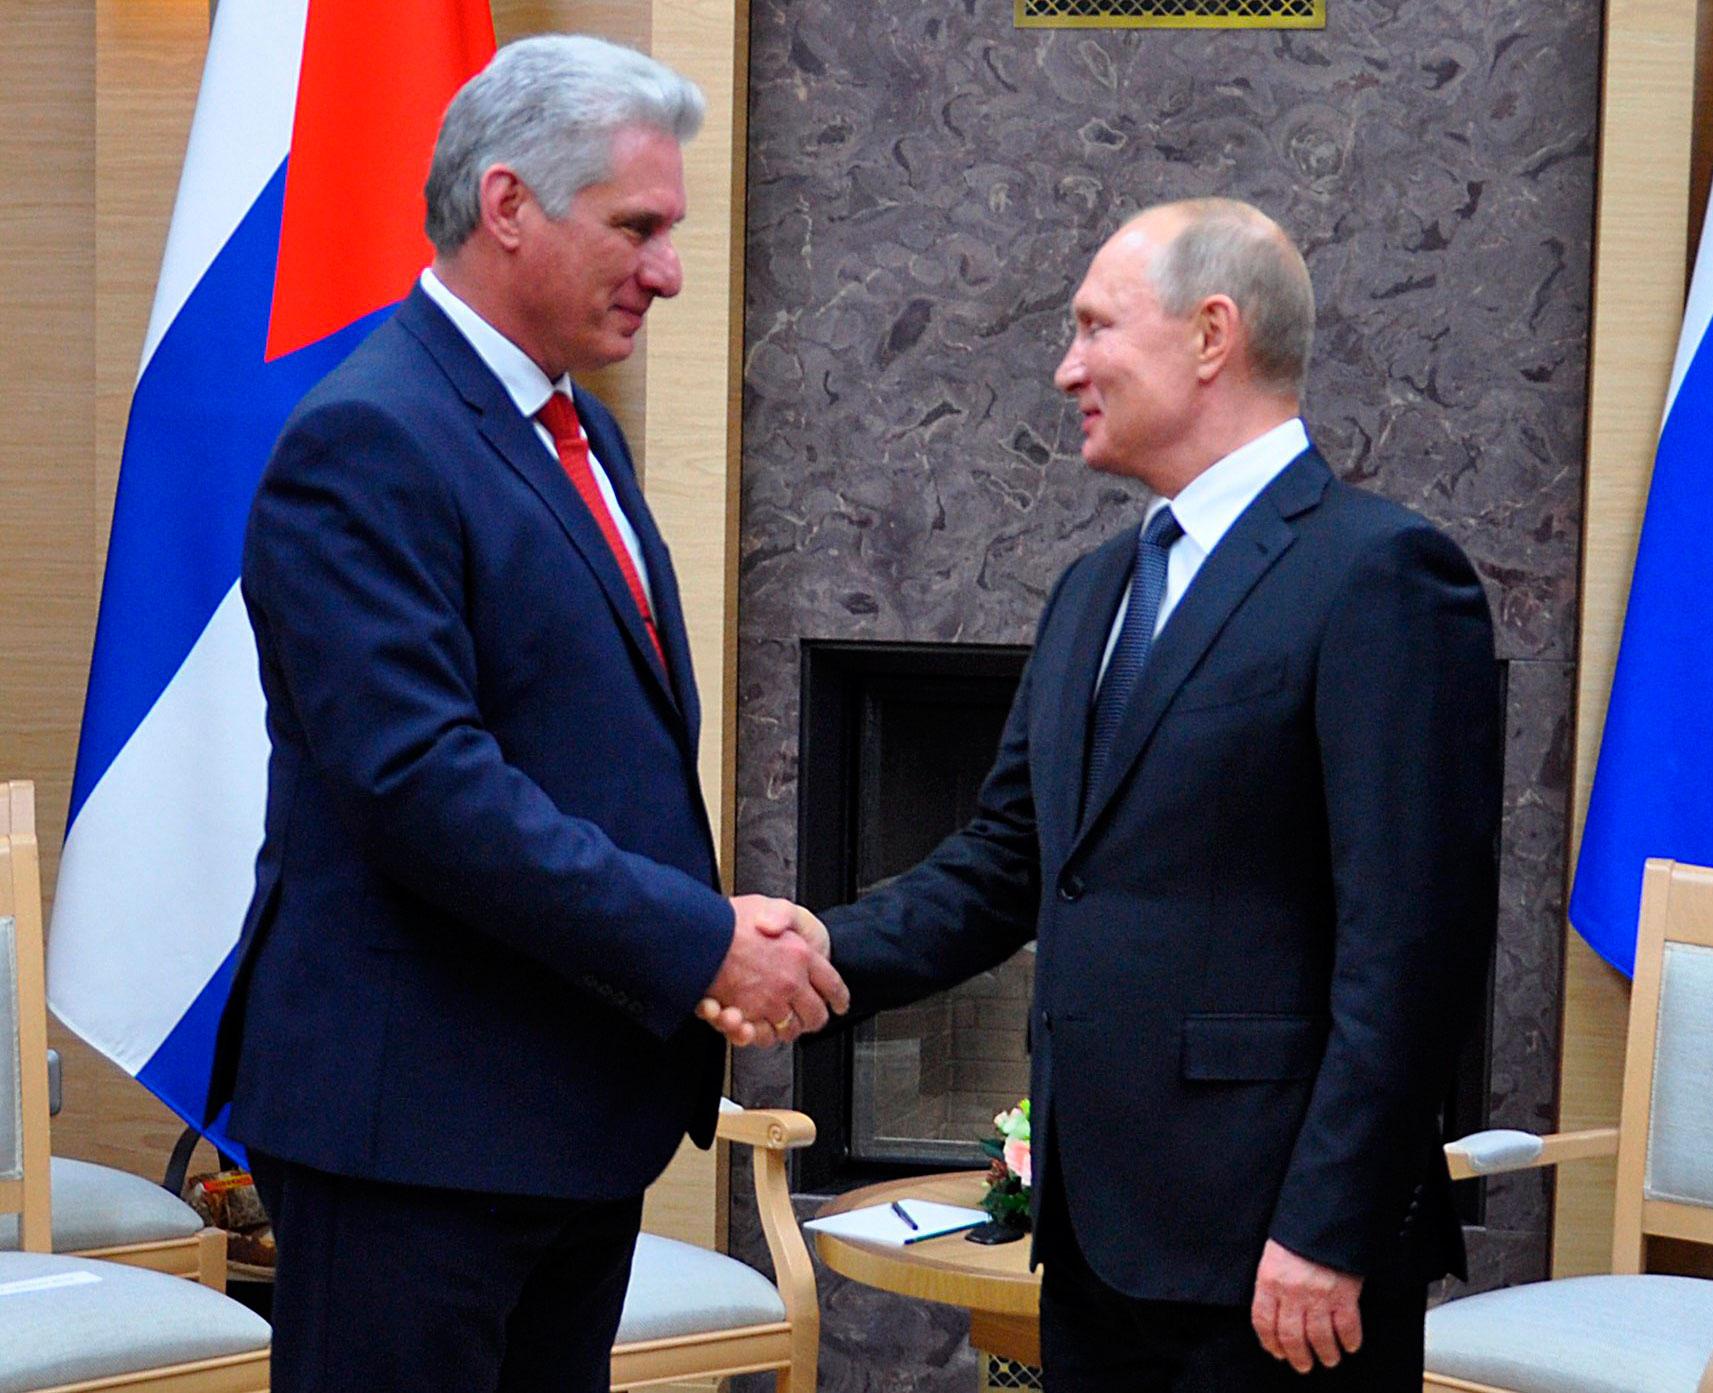 Vladimir Putin and Diaz-Canel hold talks